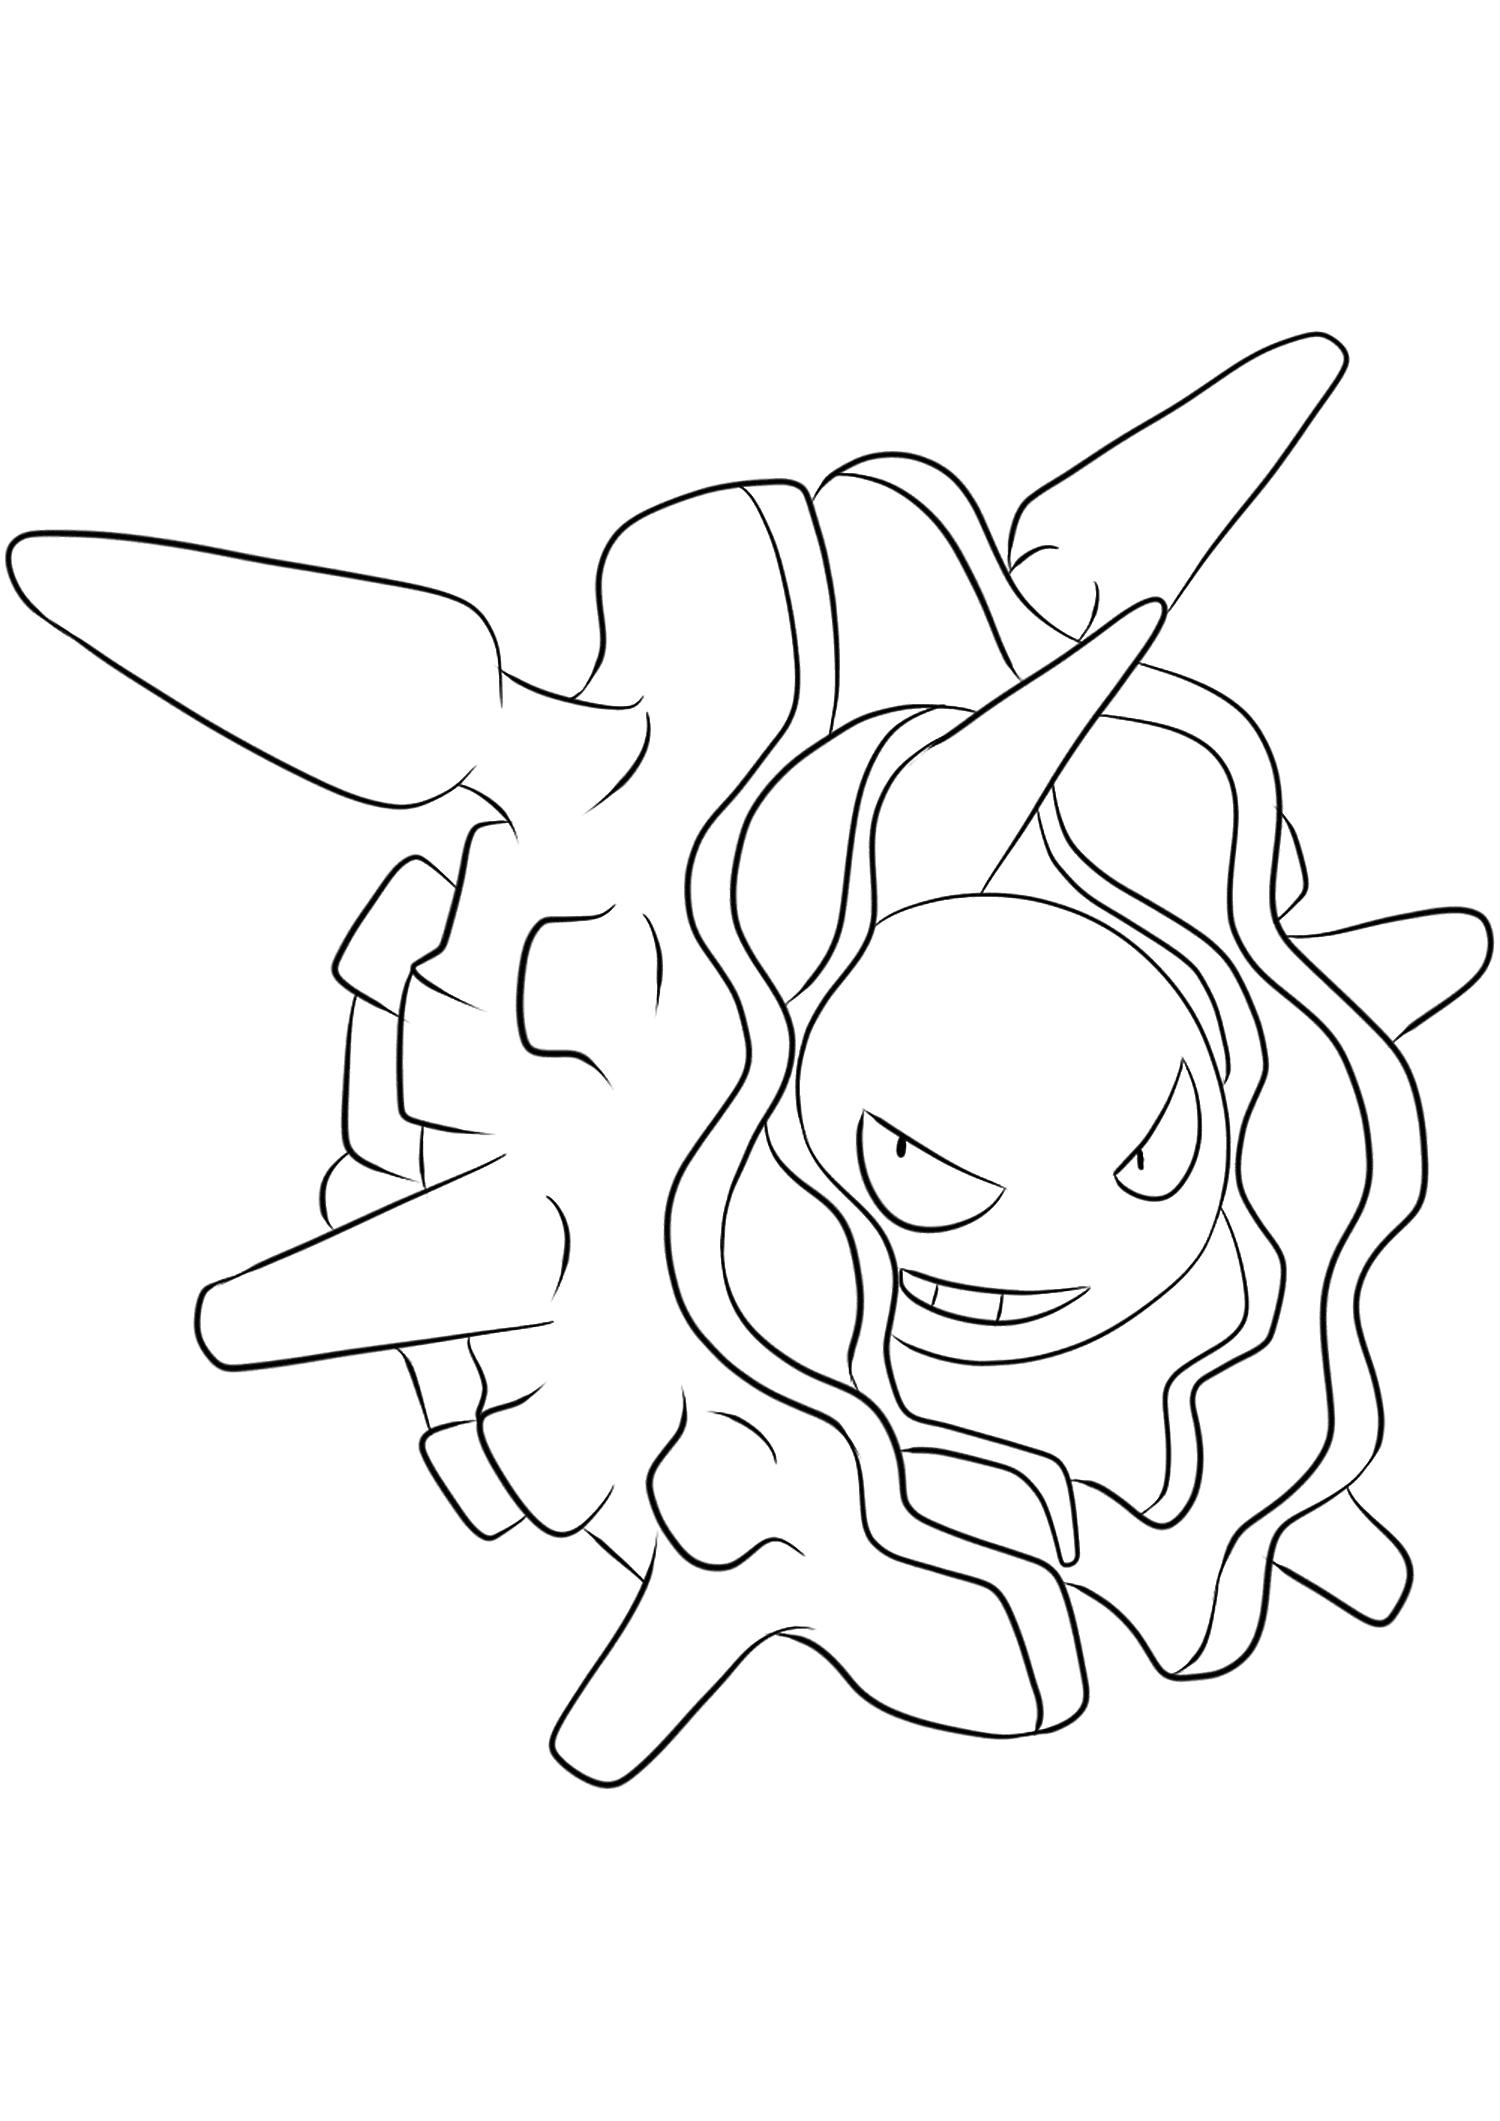 <b>Crustabri</b> (No.91) : Pokémon de génération I